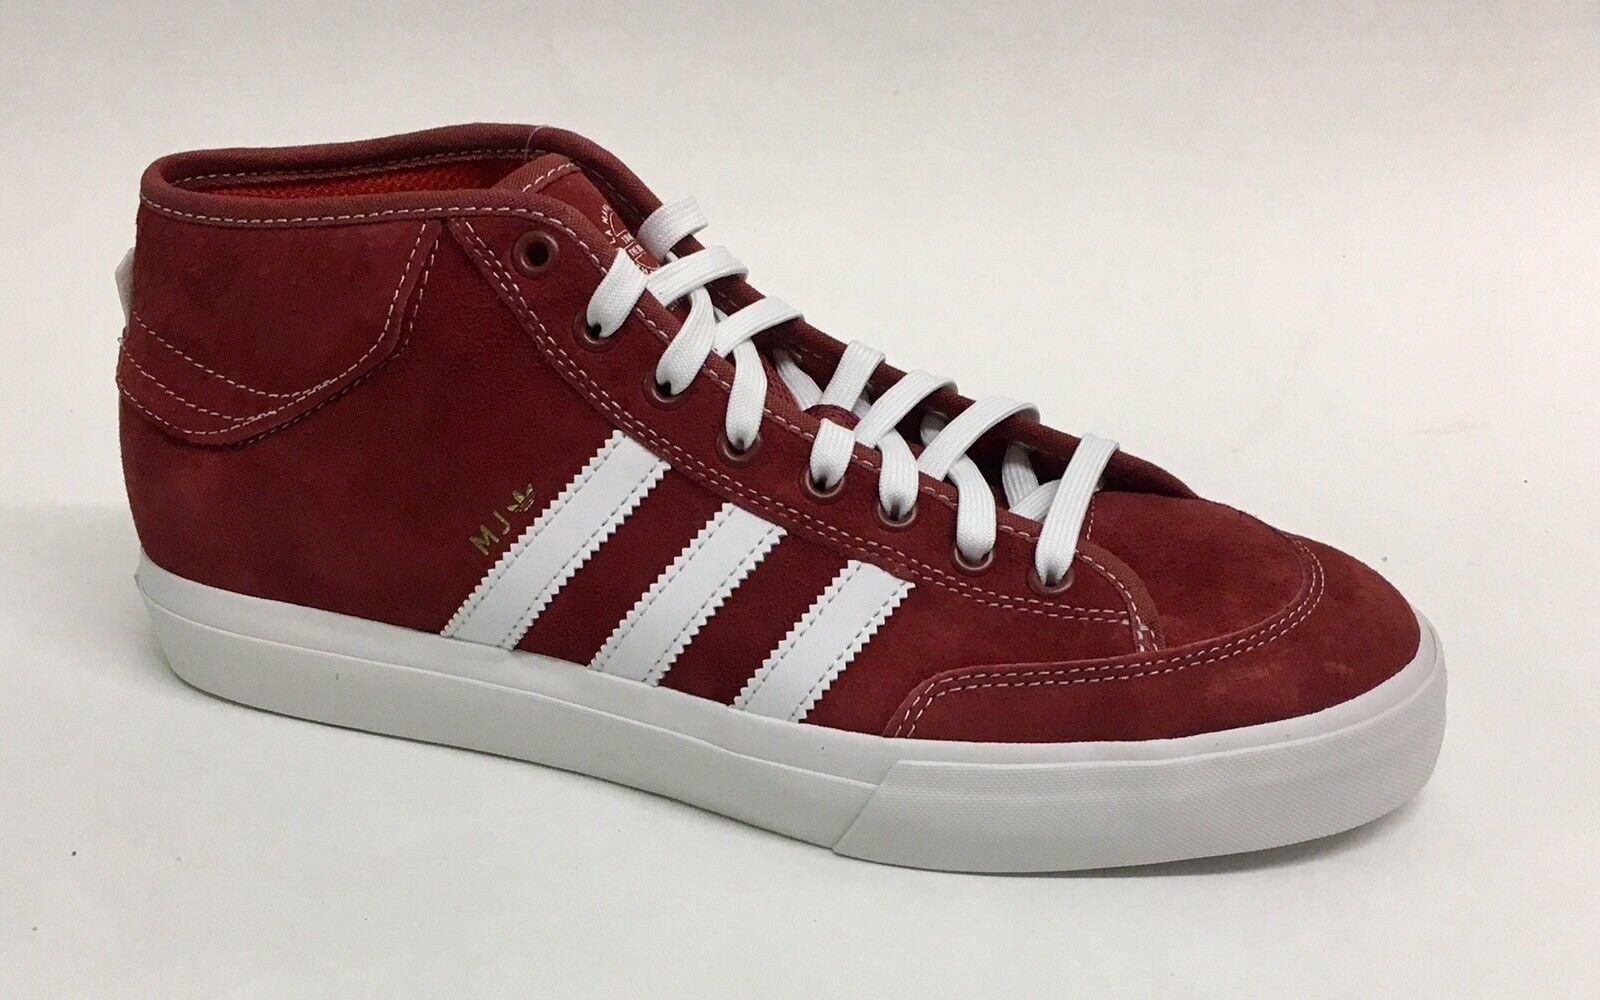 Adidas matchcourt mediados de Marc Johnson MJ comoda Rojo cg5670 Skateboard Shoe comoda MJ marca de descuento 00272e